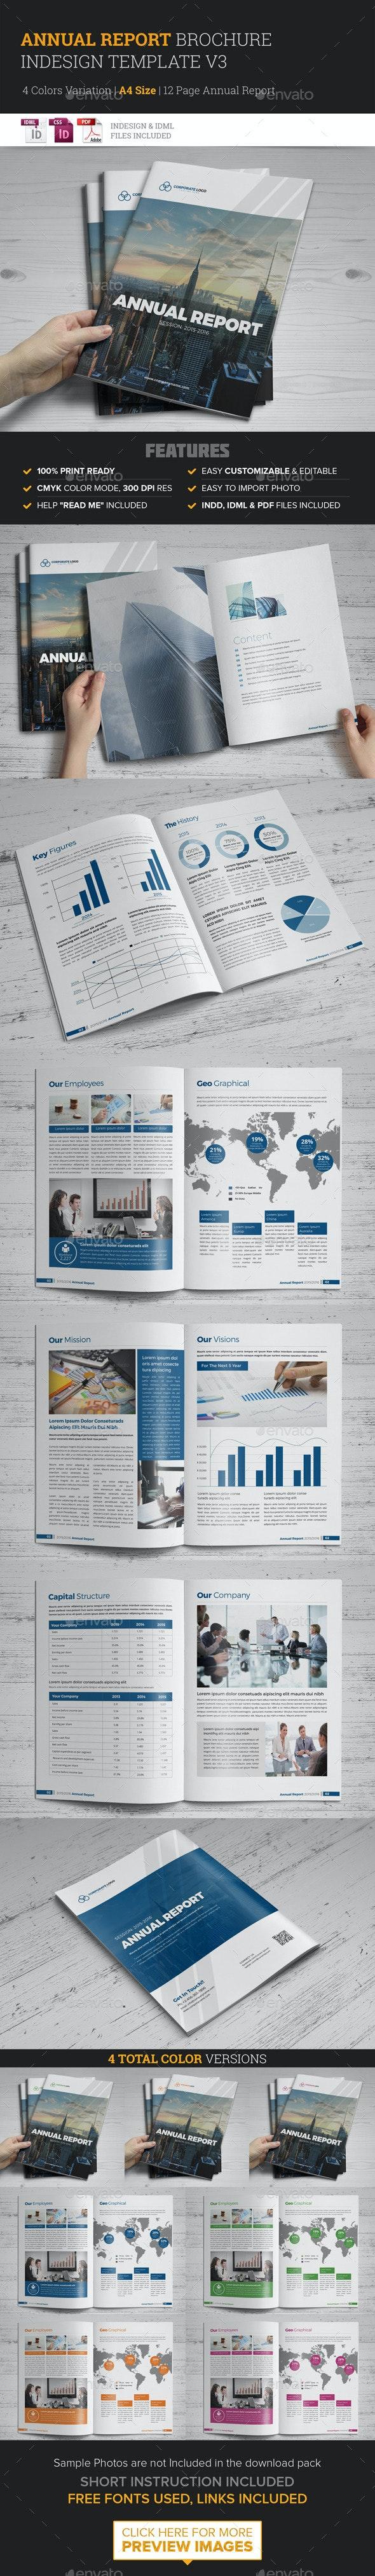 Annual Report Brochure Indesign Template 3 - Corporate Brochures